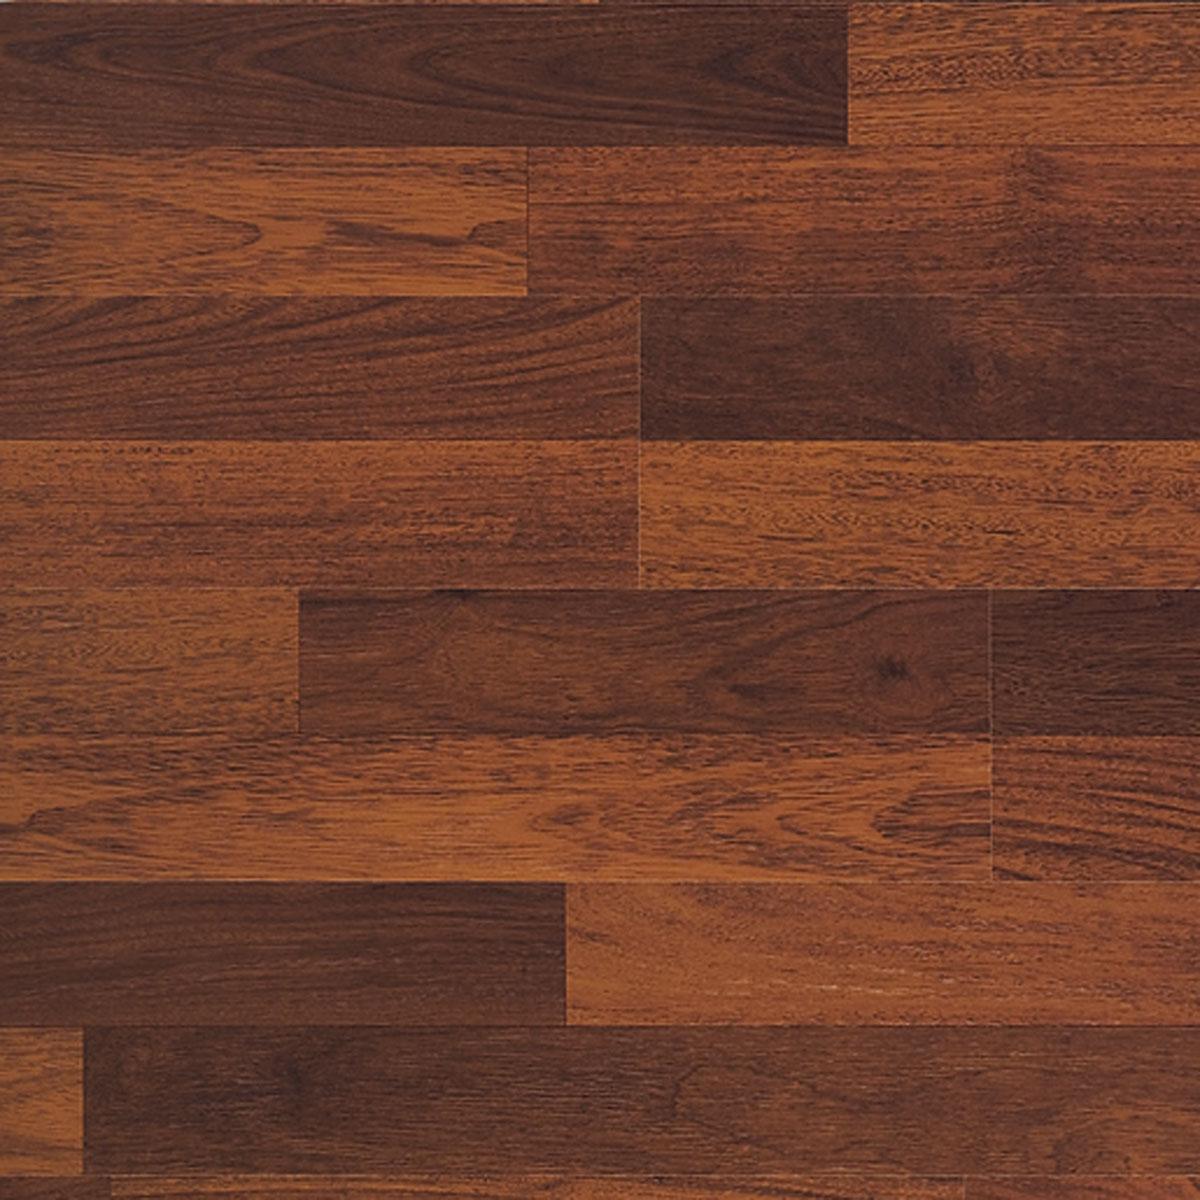 laminated wooden flooring photo - 6